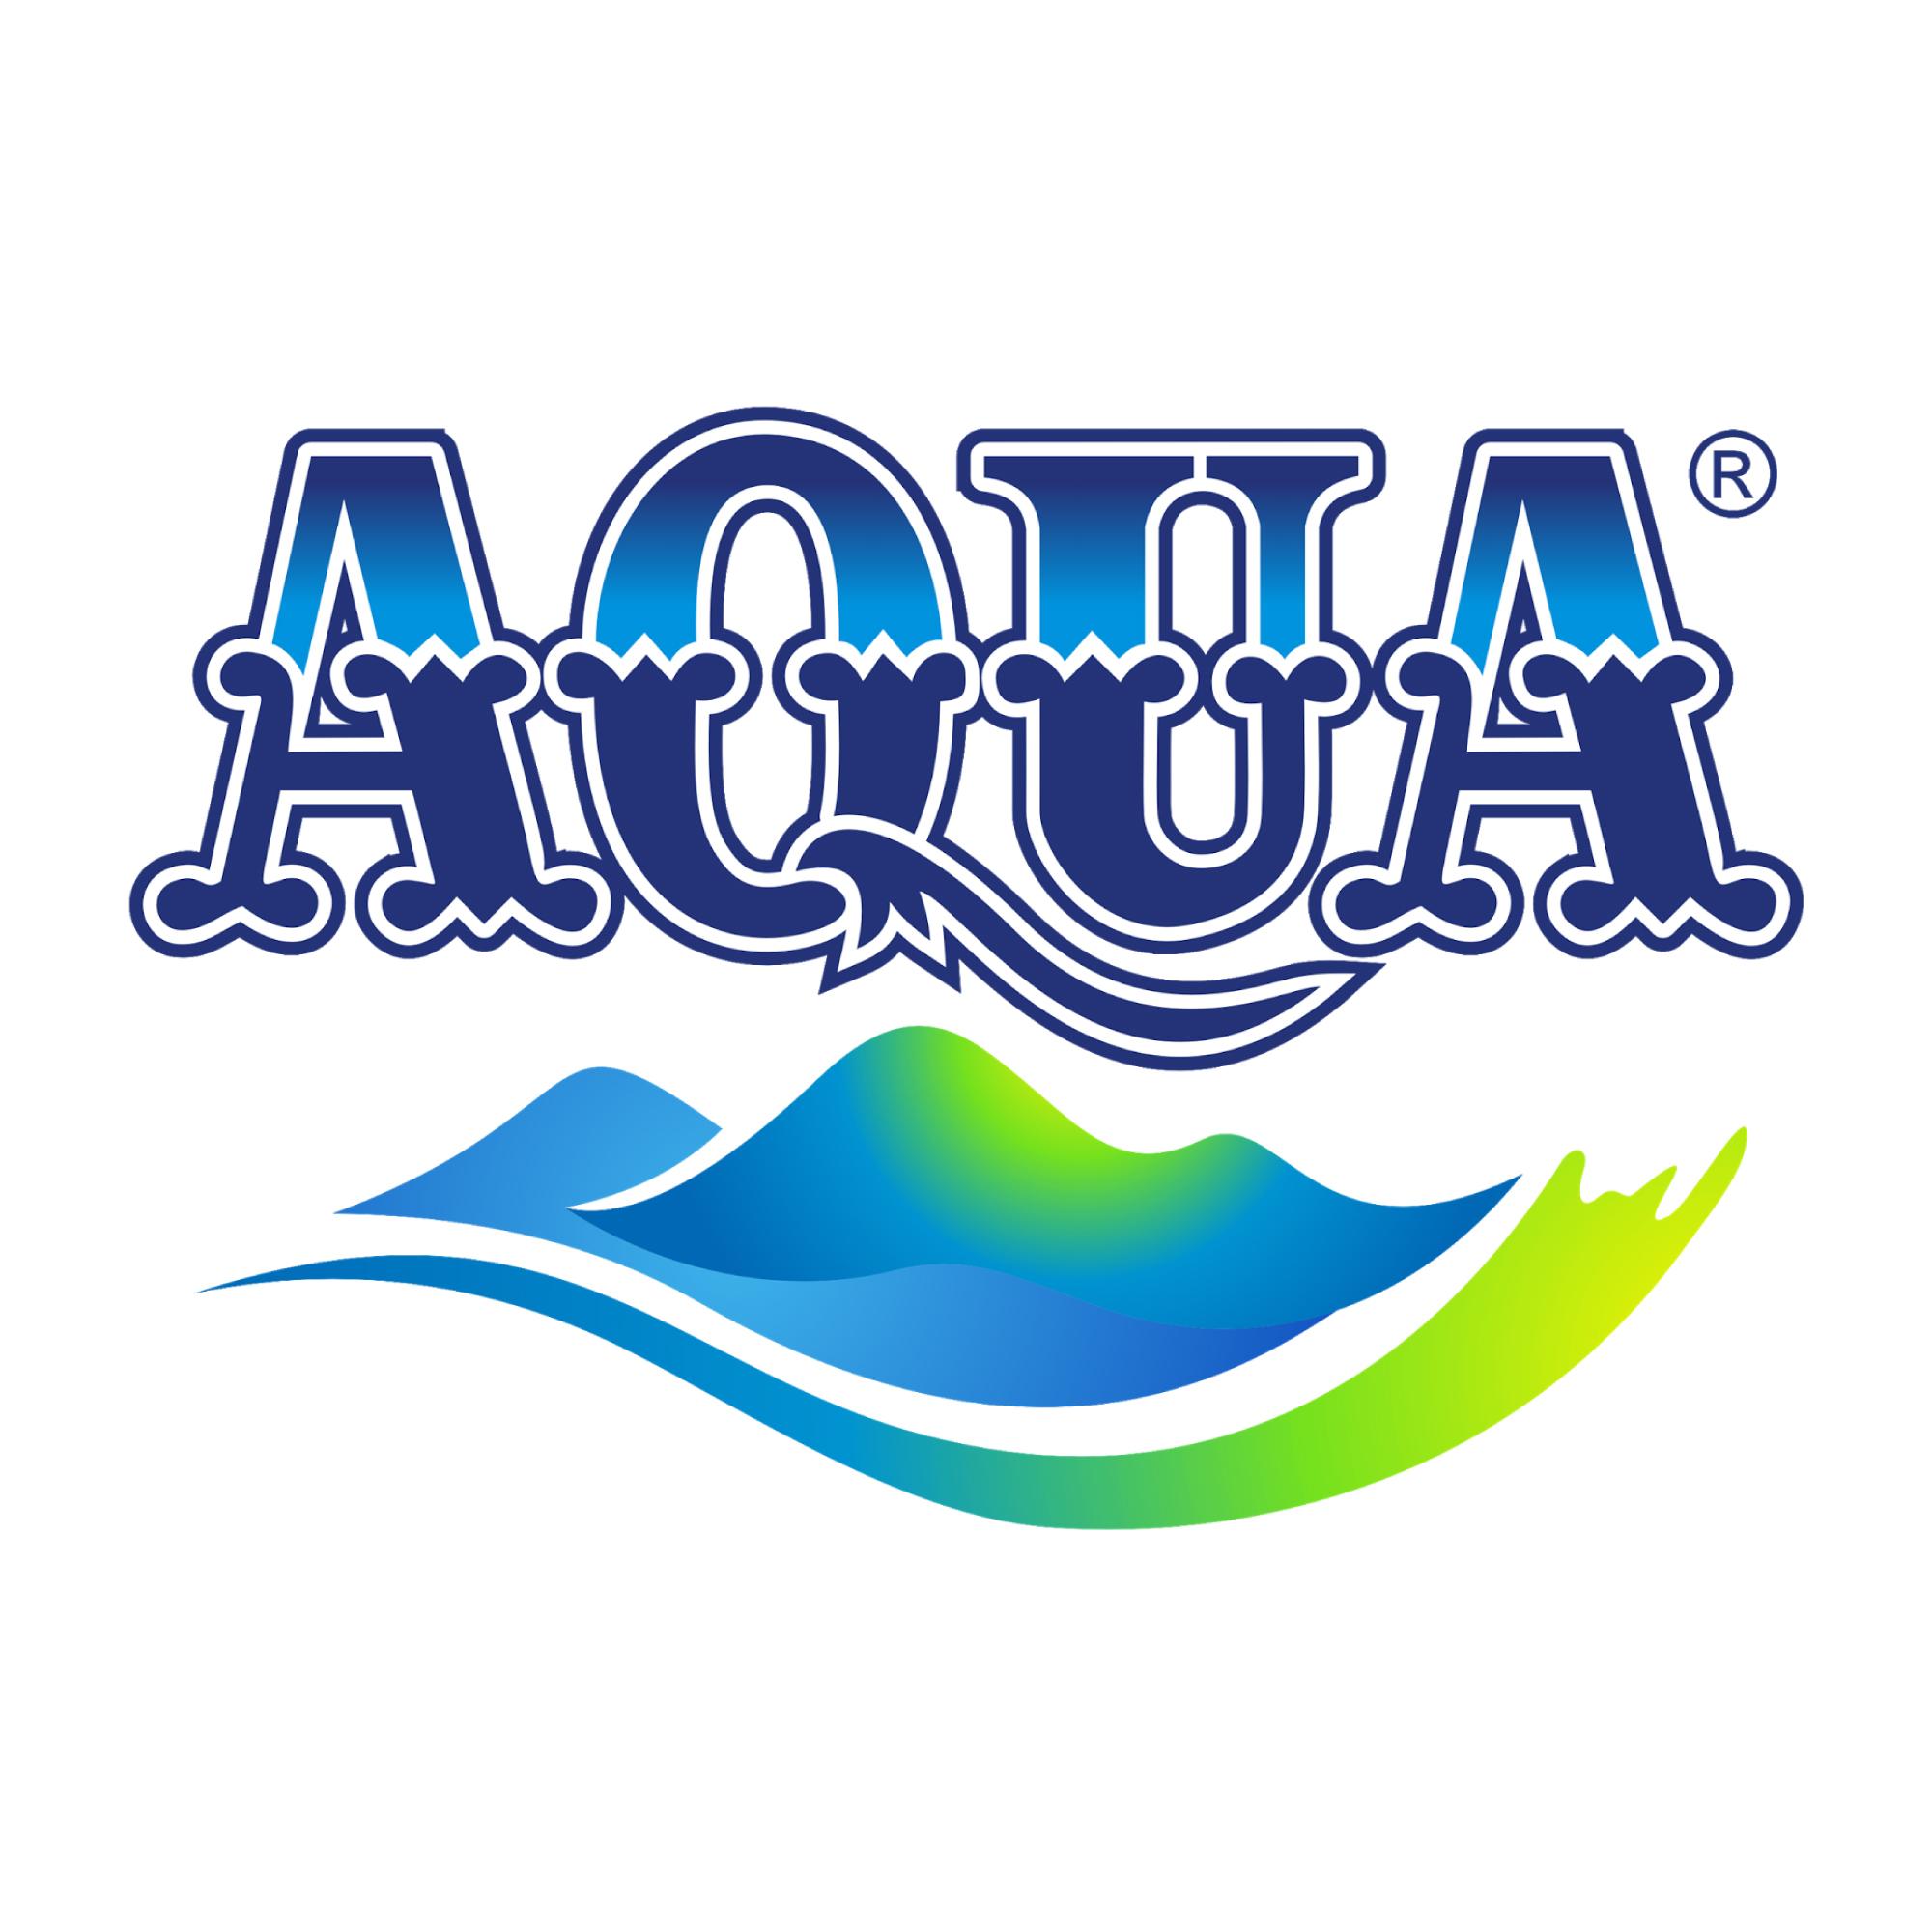 Jual Aqua Botol Air Mineral Kemasan 600 Ml 24 Terbaru 1500ml X 12pcs Jabodetabek